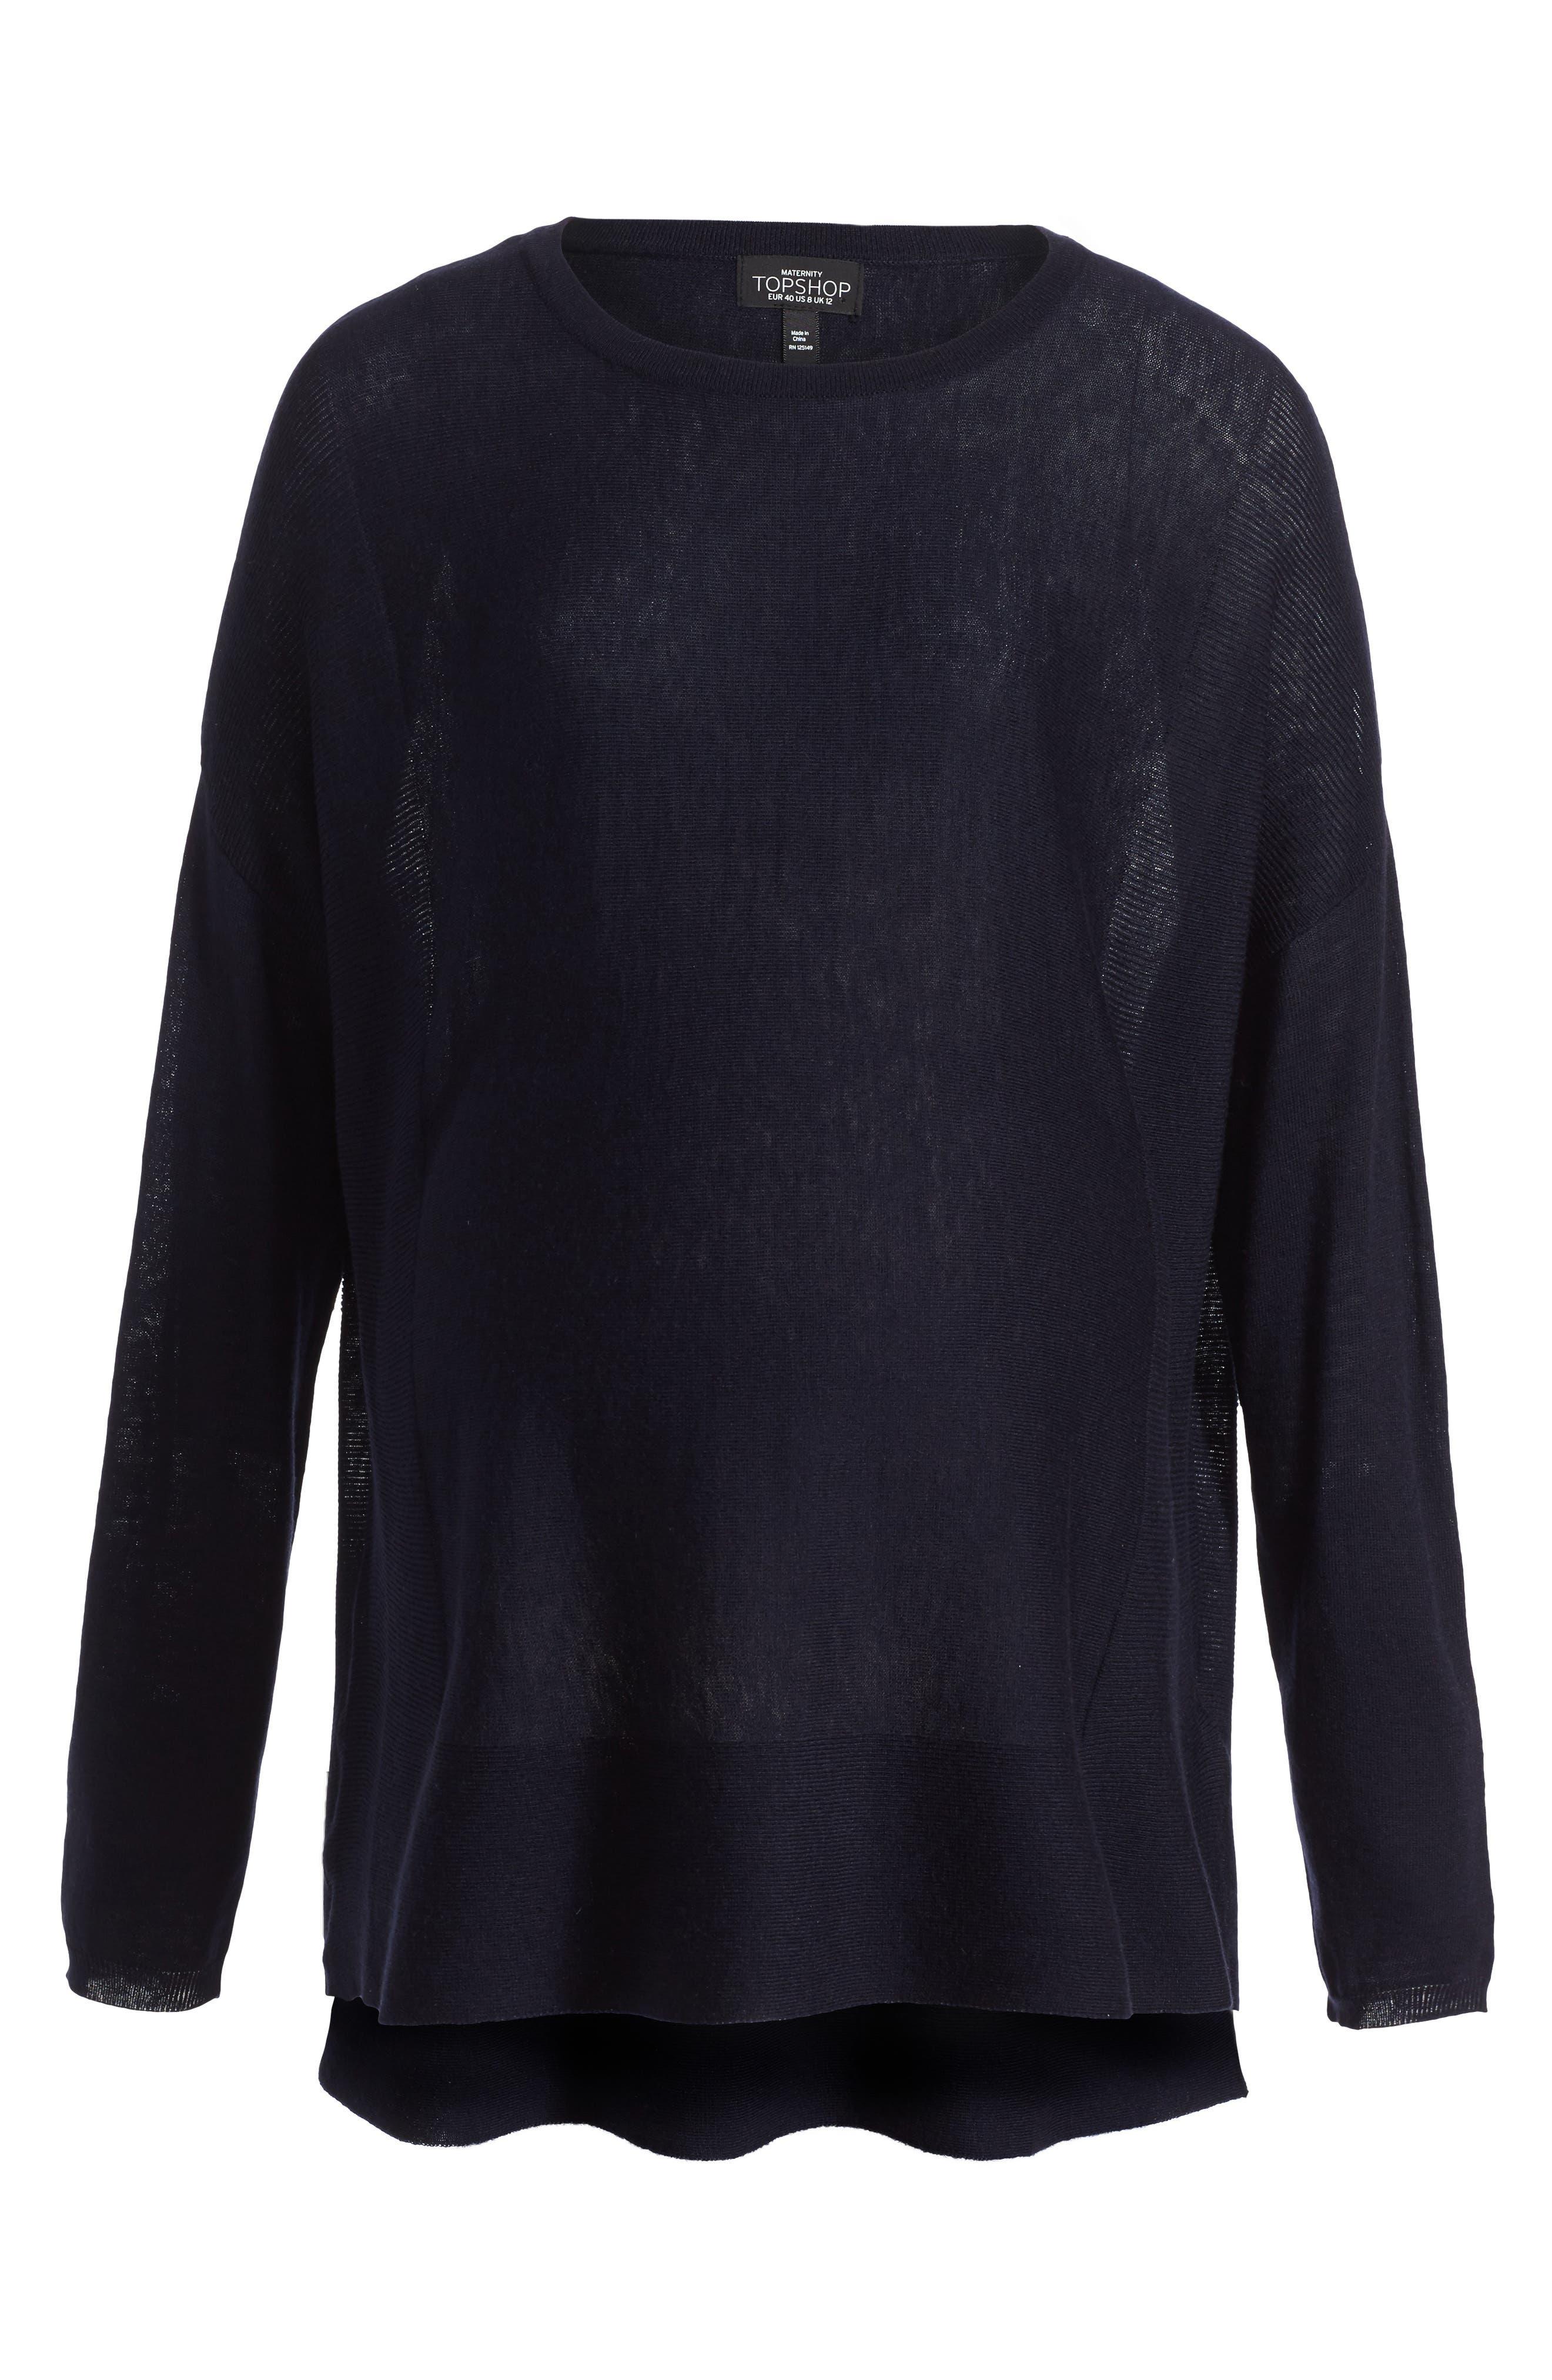 Alternate Image 1 Selected - Topshop Crewneck Maternity Sweater